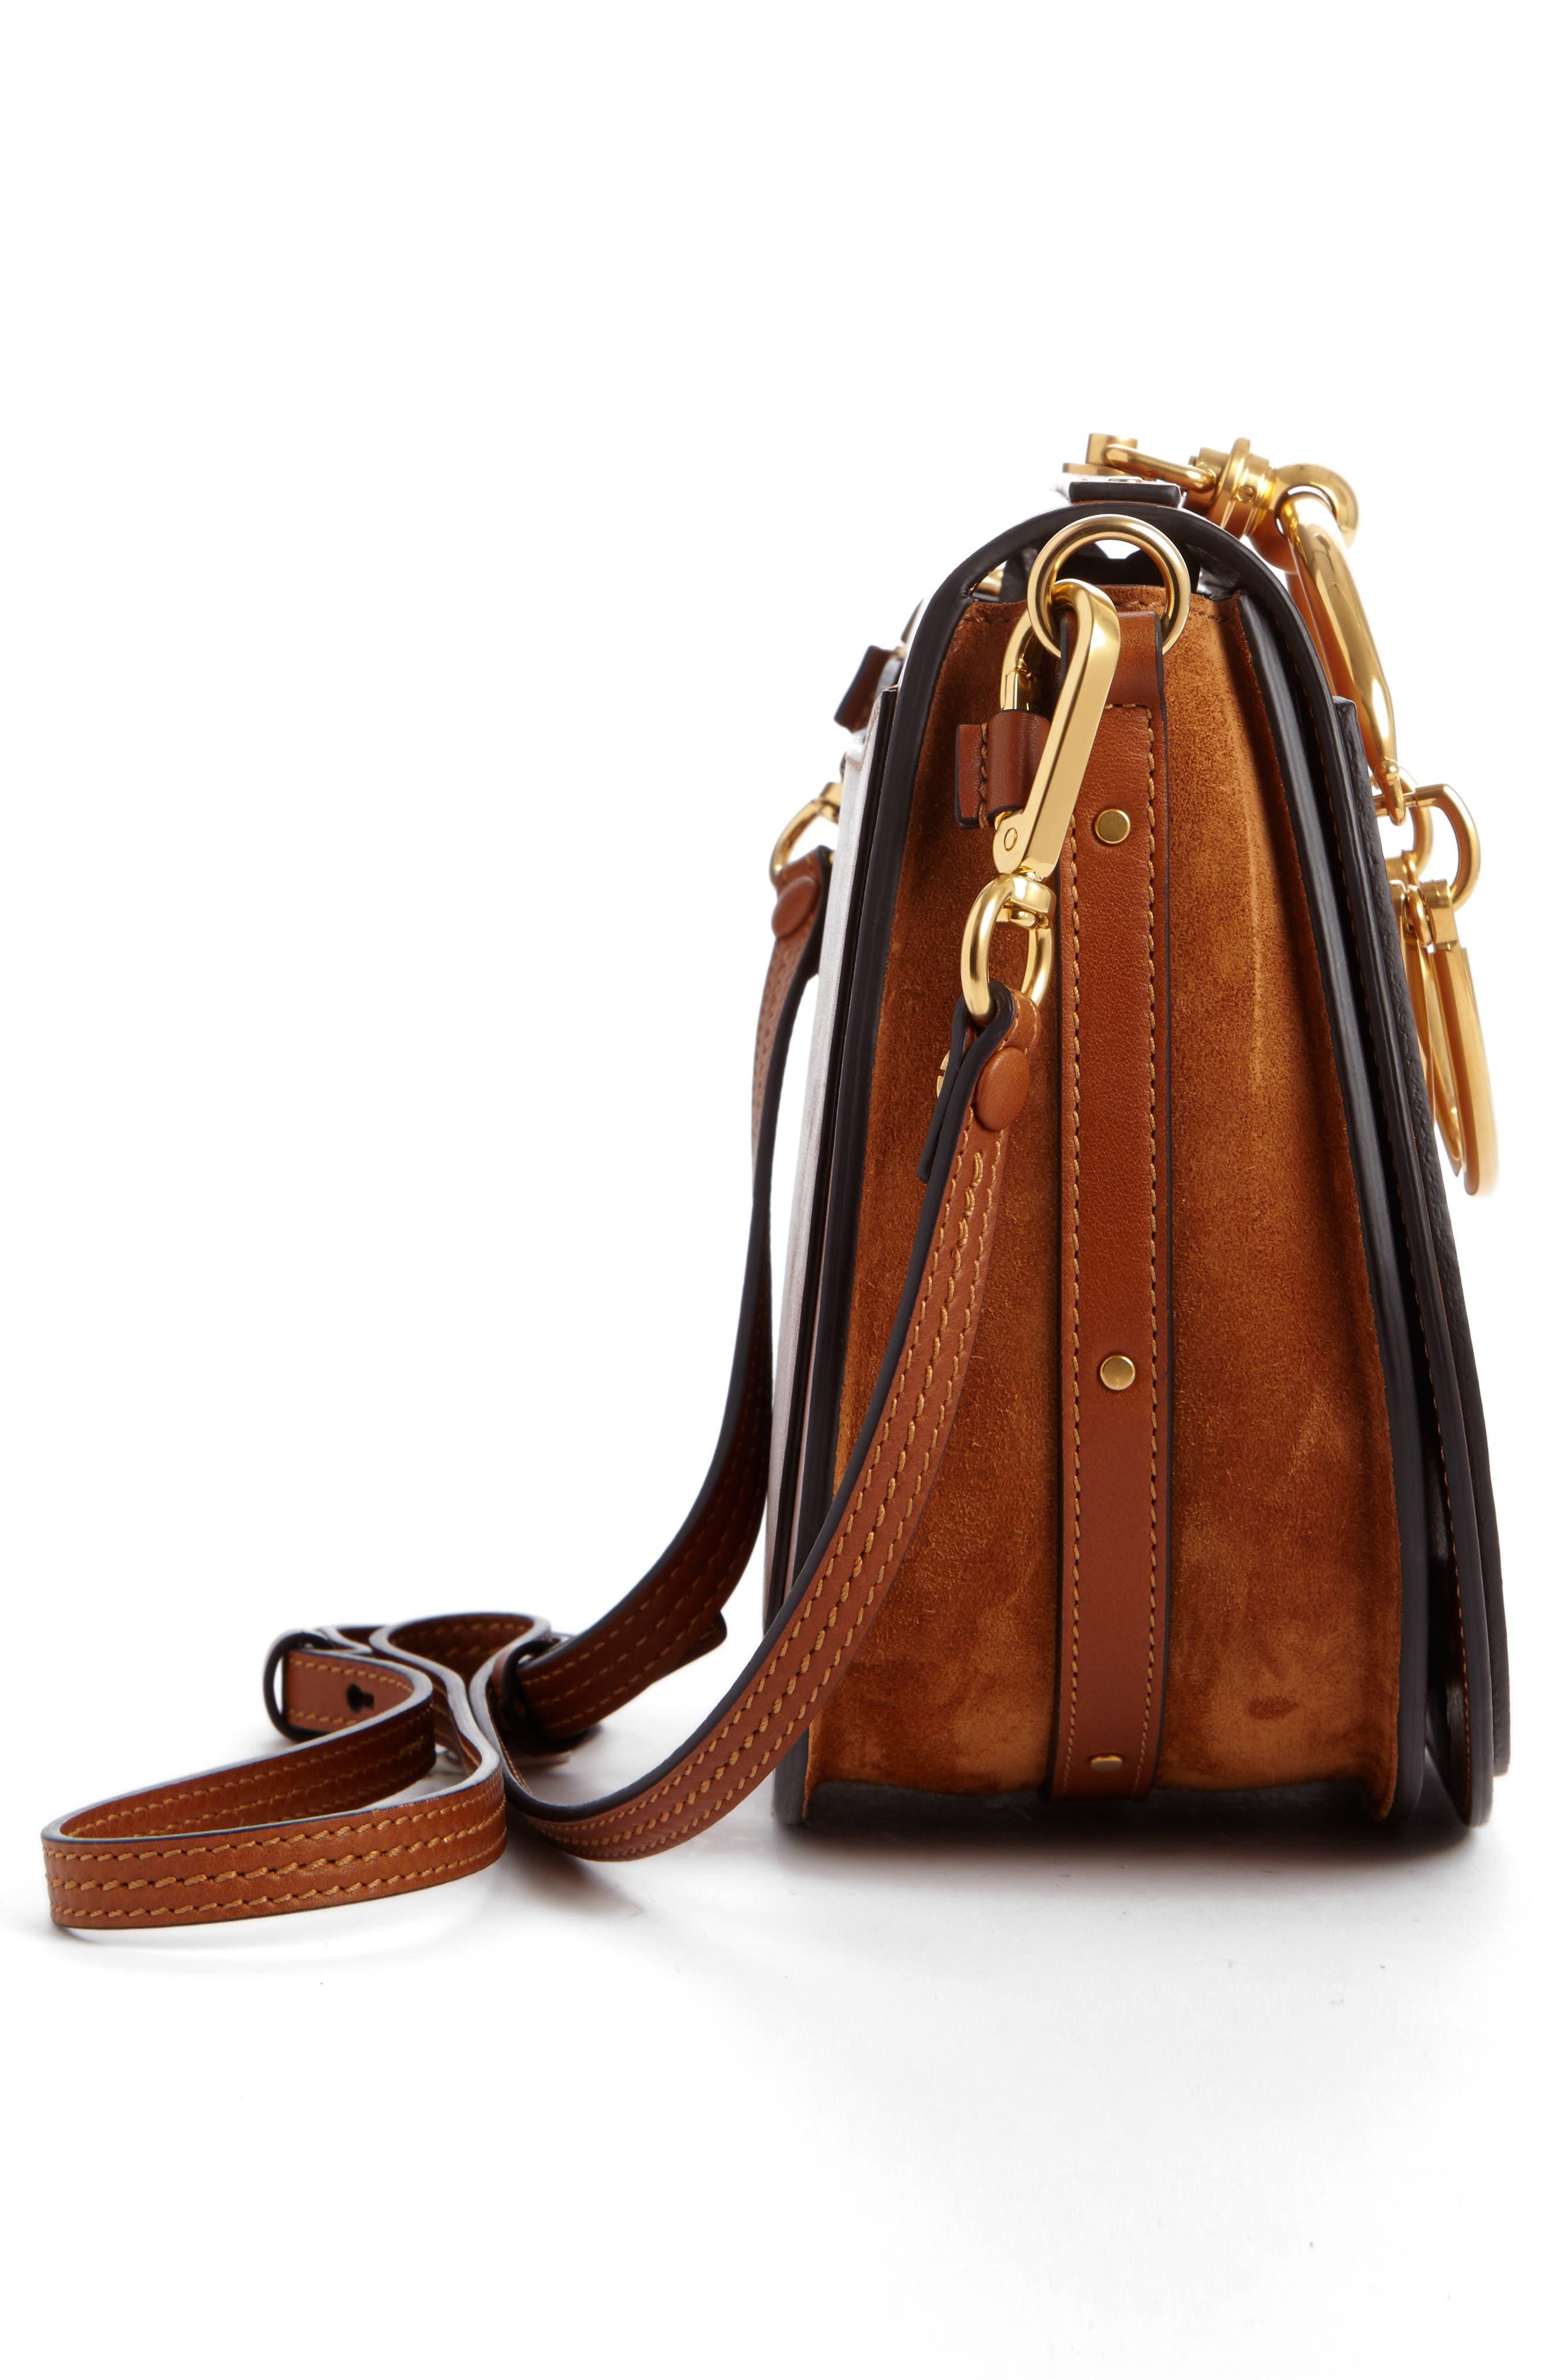 Medium Nile Leather Bracelet Saddle Bag,                             Alternate thumbnail 3, color,                             Bdu Caramel